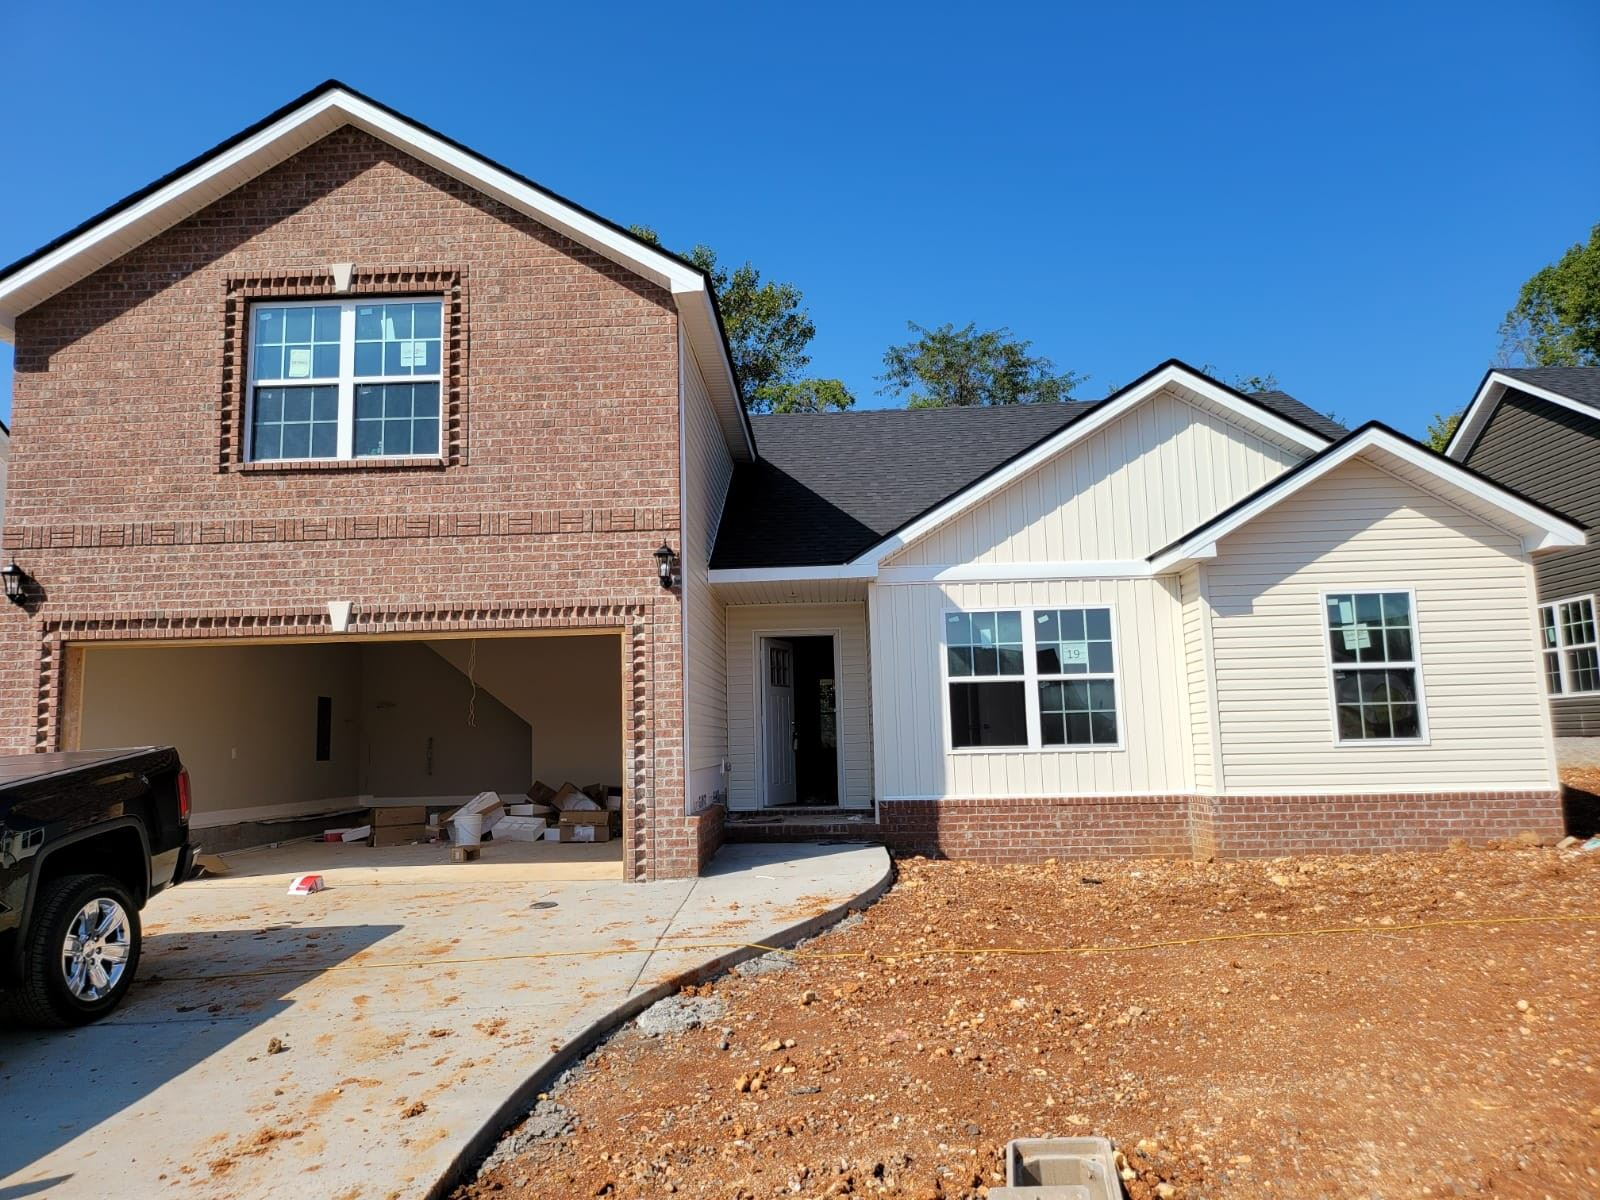 19 Irish Hills, Clarksville, TN 37042 - MLS#: 2274739